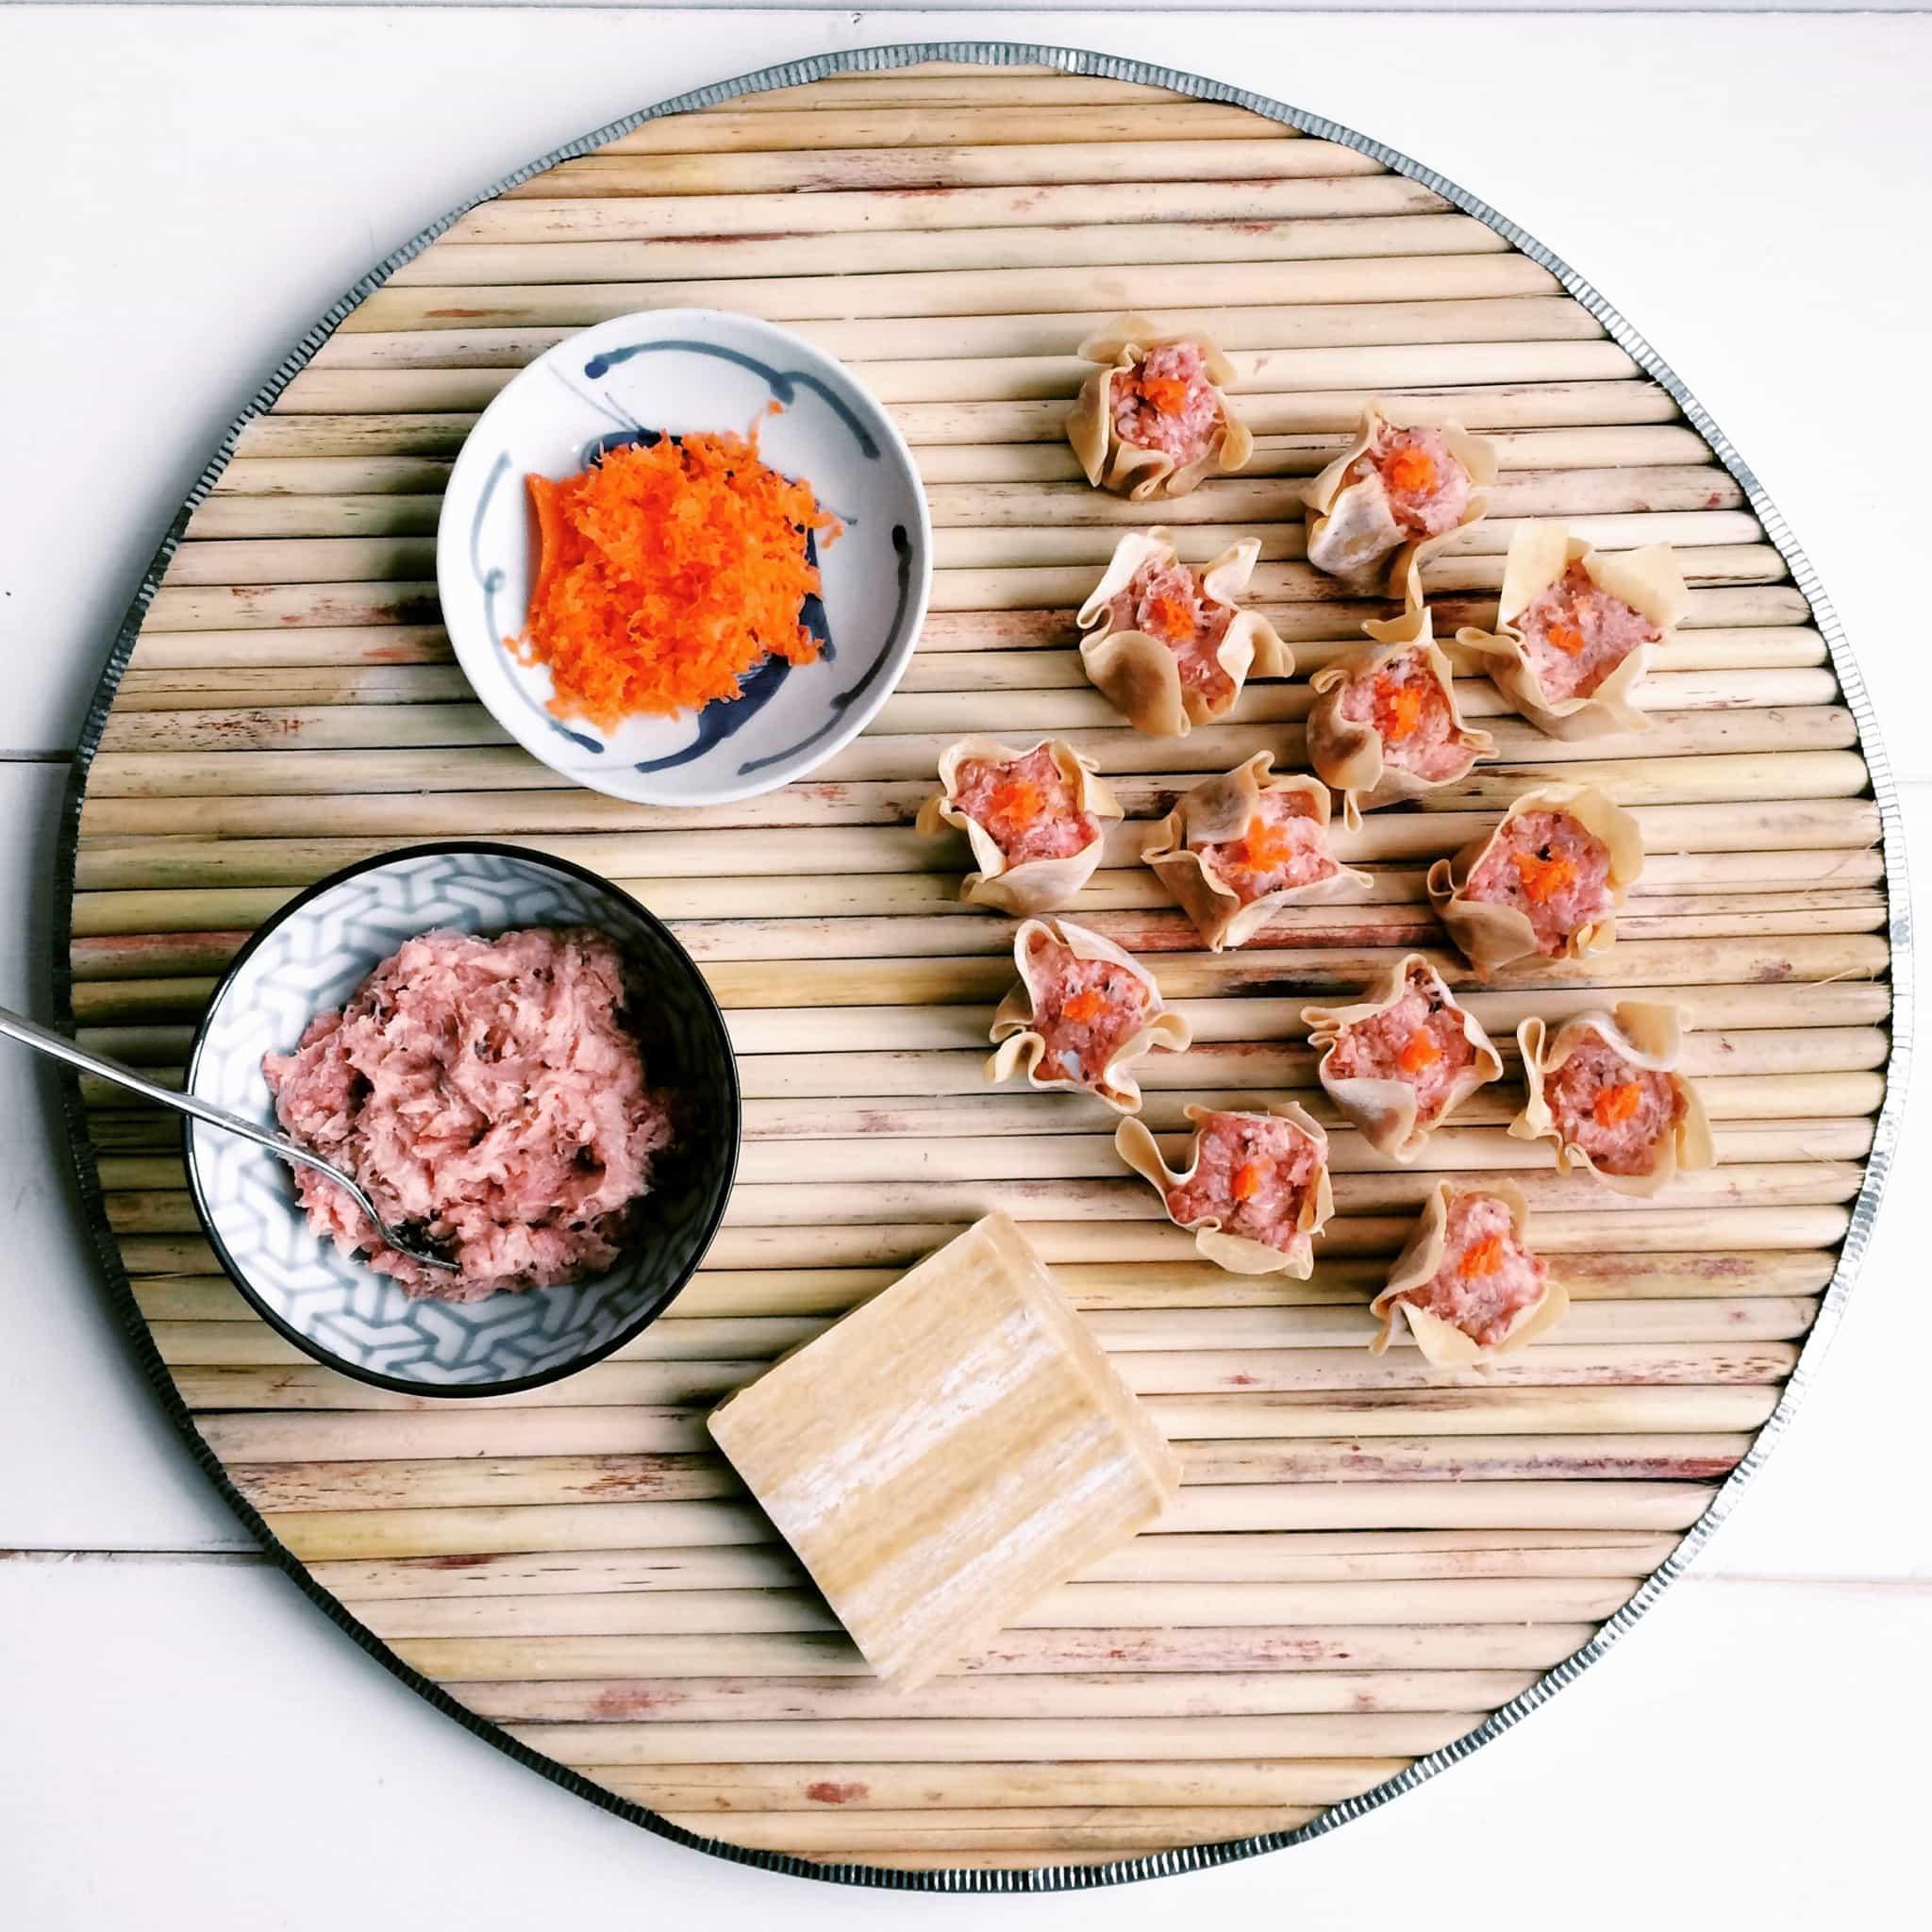 IMG 0945 - Recept Siu Mai - Dim Sum